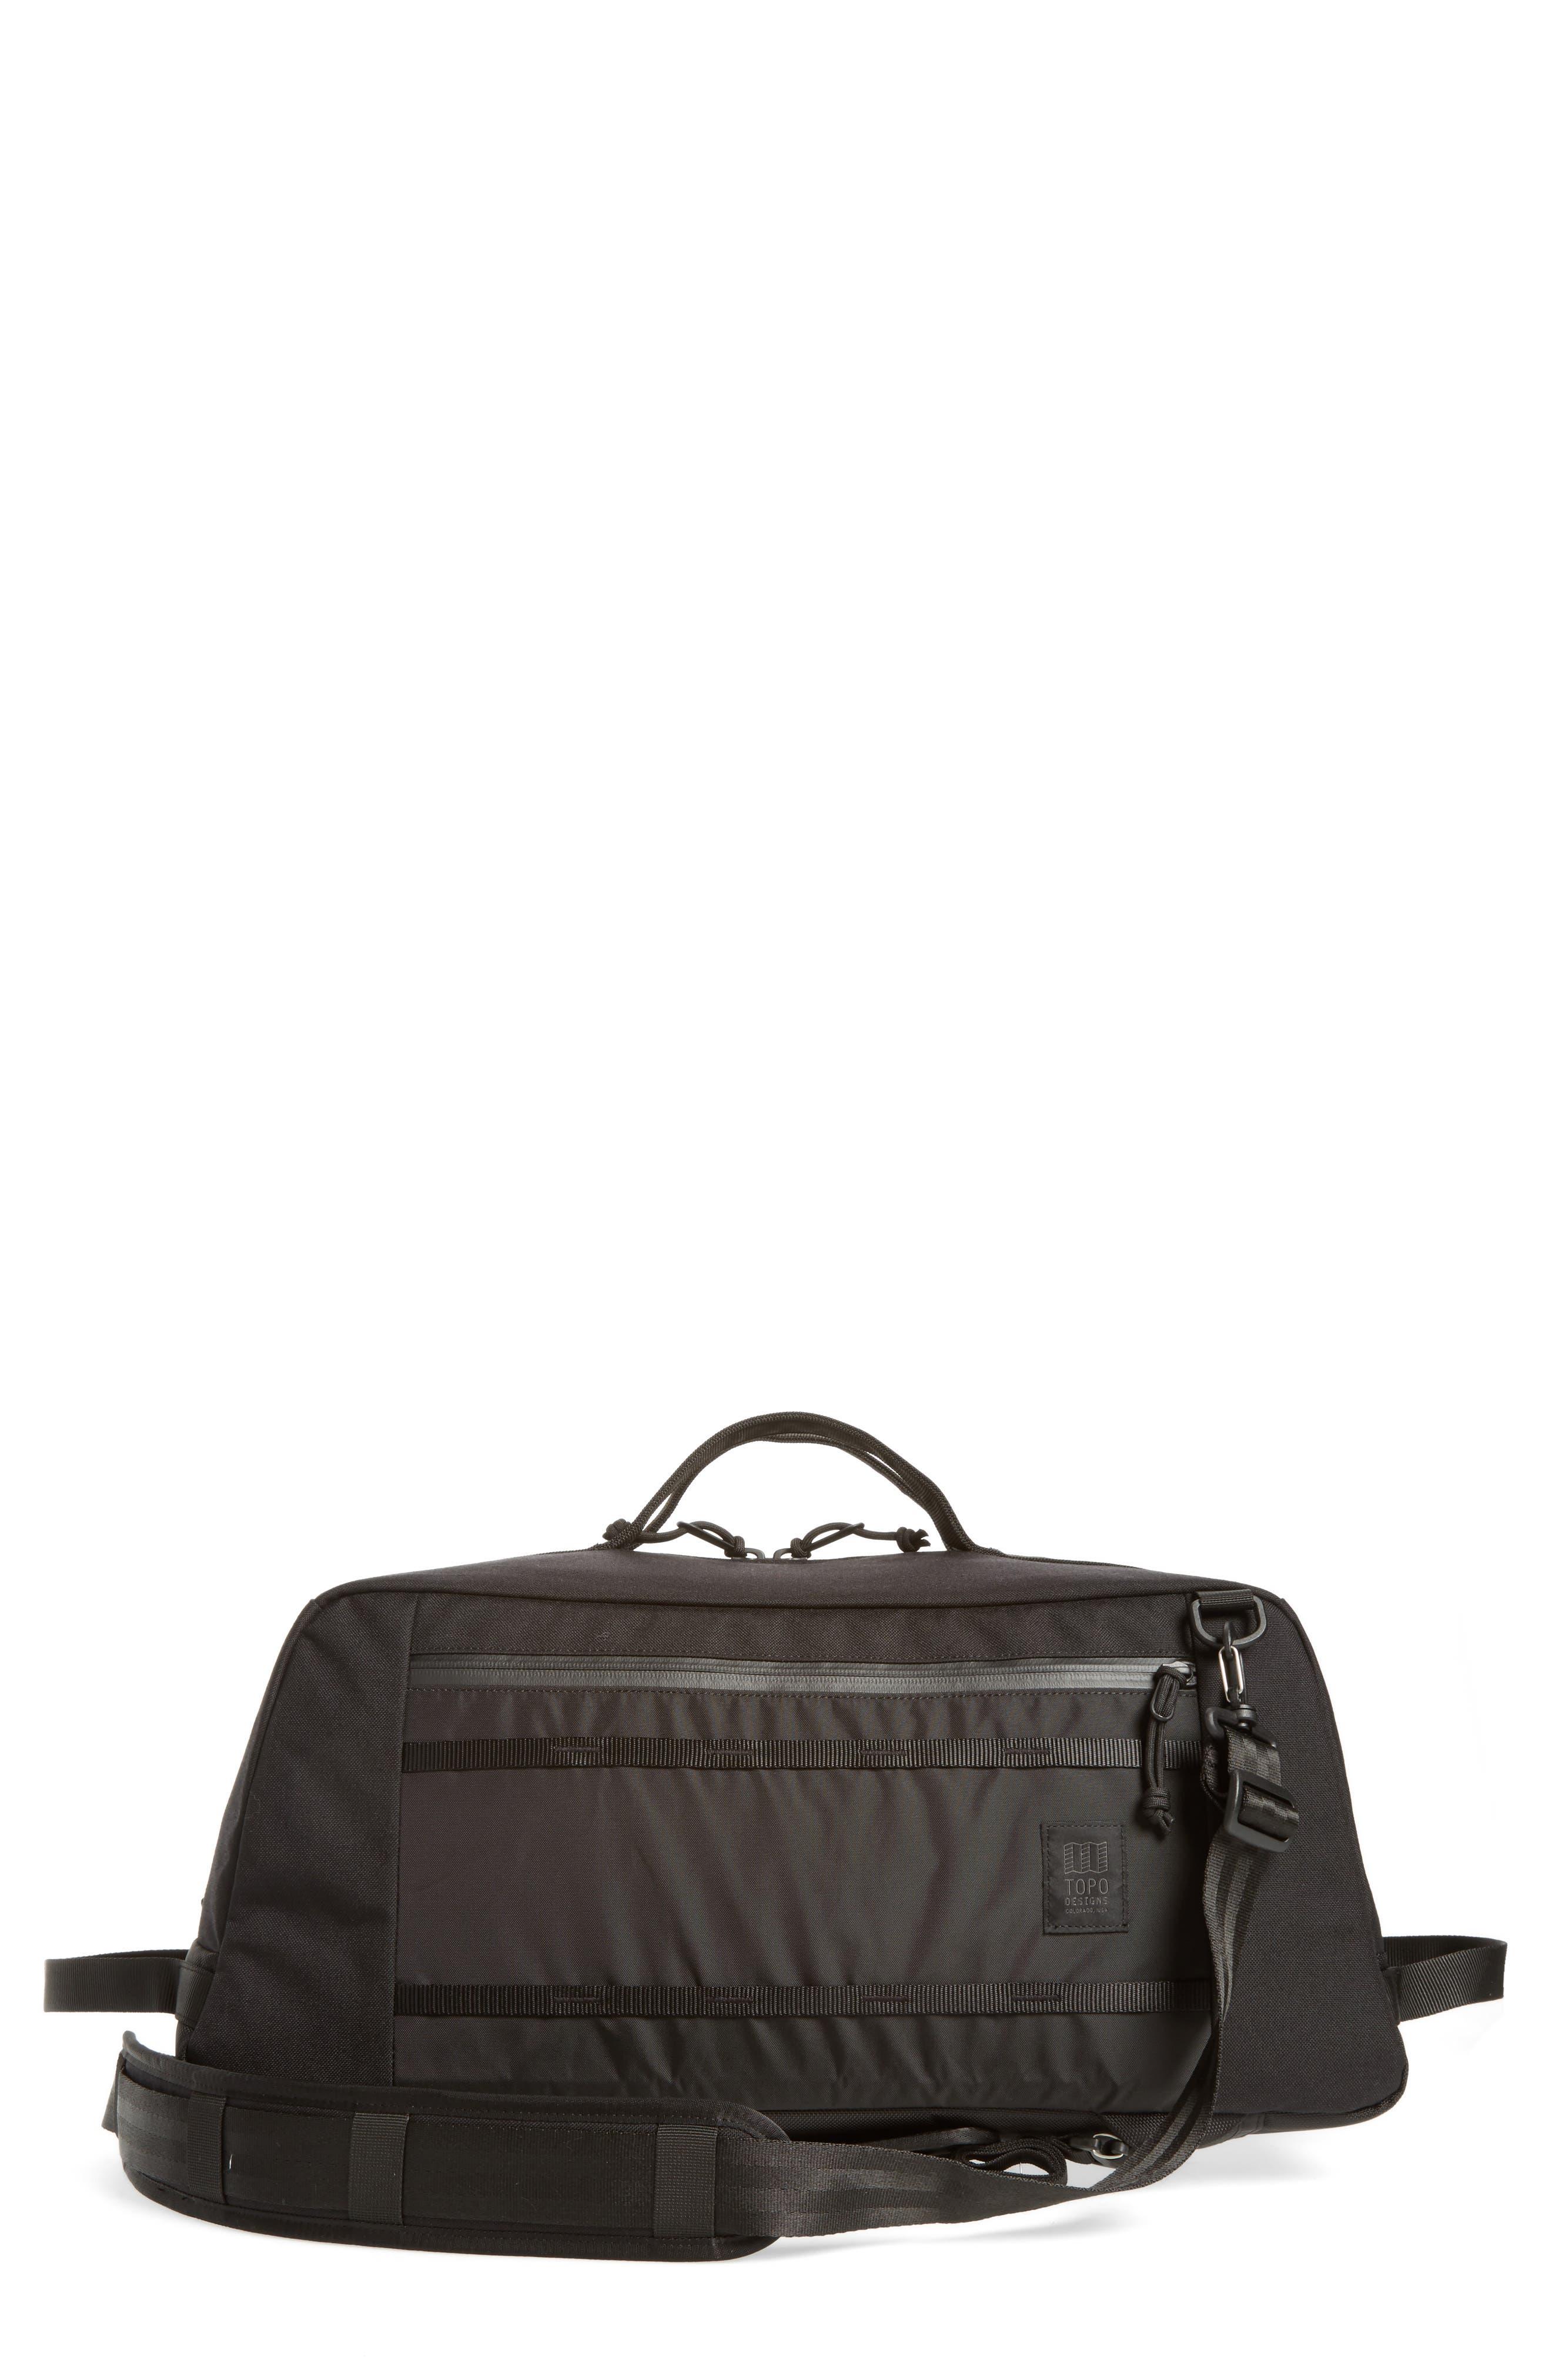 Alternate Image 1 Selected - Topo Designs Mountain Convertible Duffel Bag